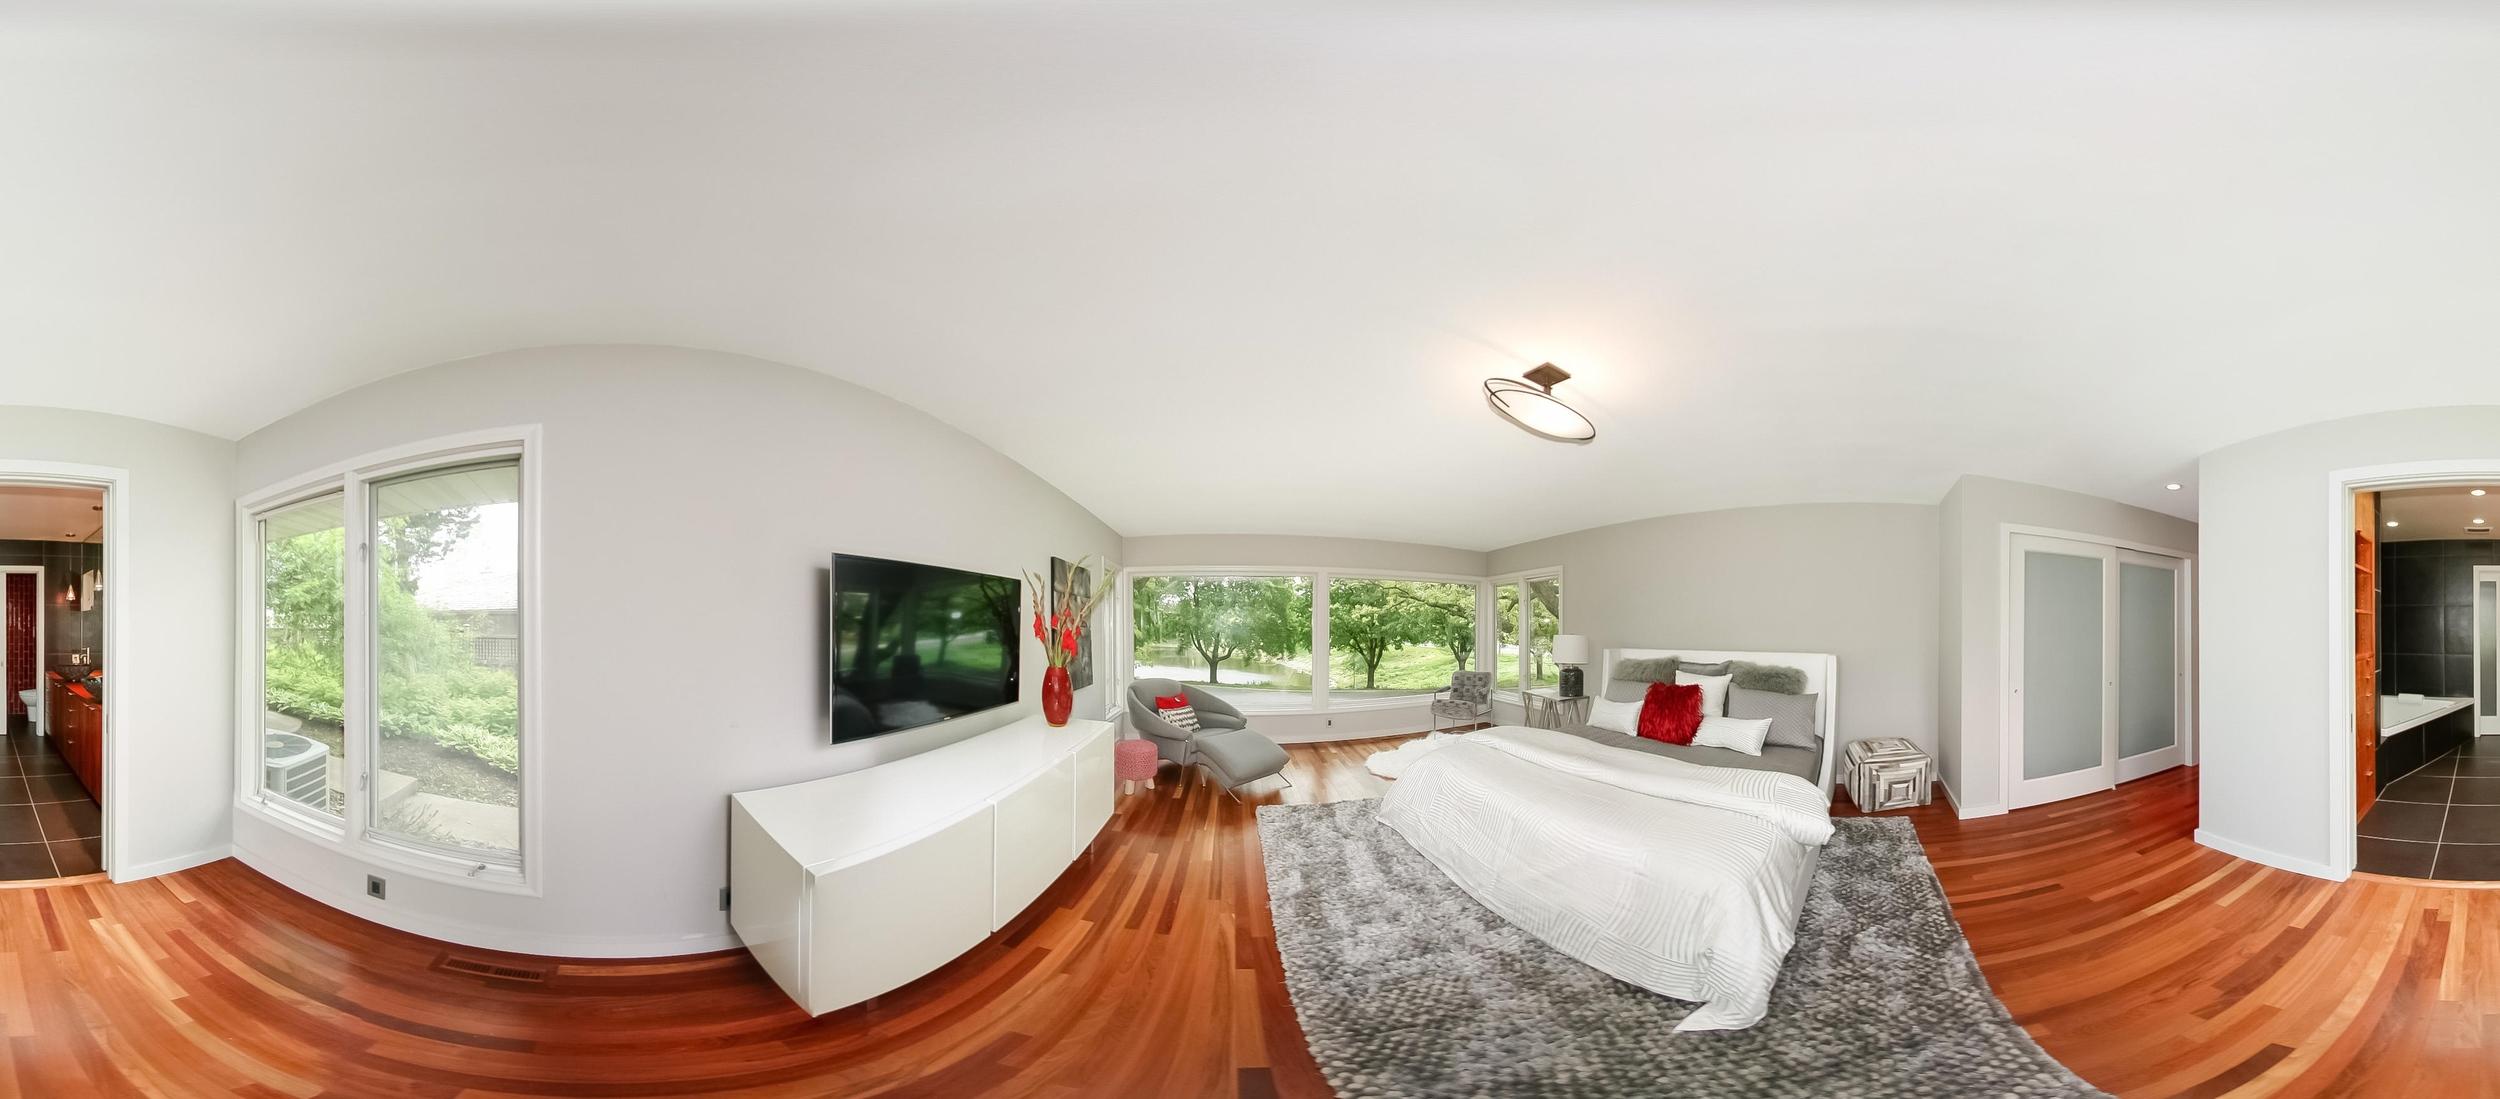 2525 France Ave S St Louis-large-031-11-Master Bedroom 360-3996x1998-72dpi.jpg